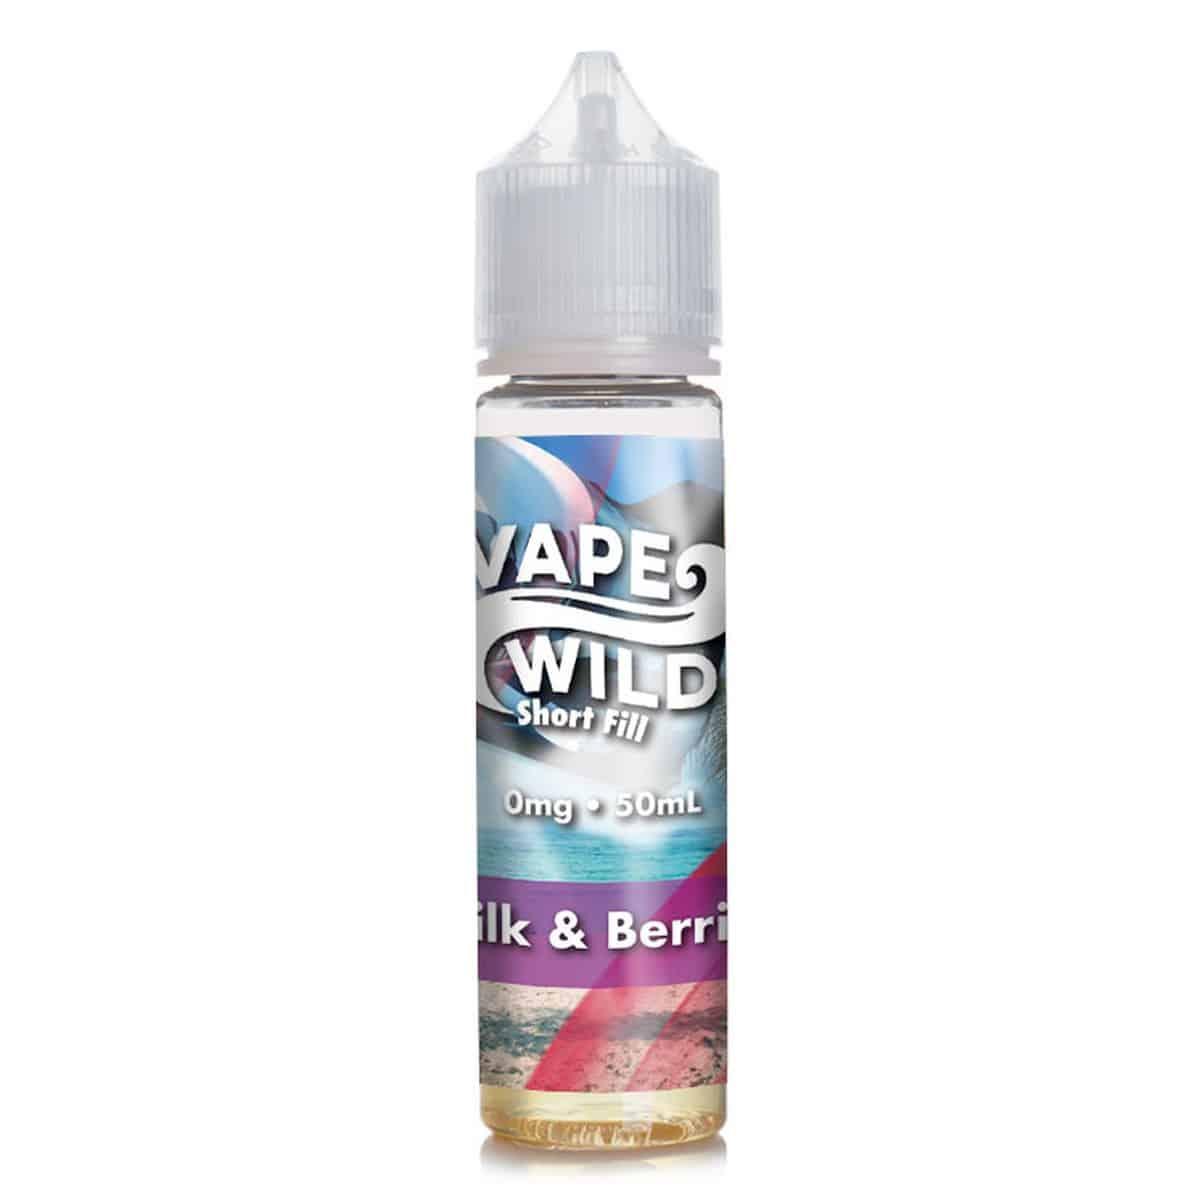 Milk & Berries Vape Wild Shortfill 50ml